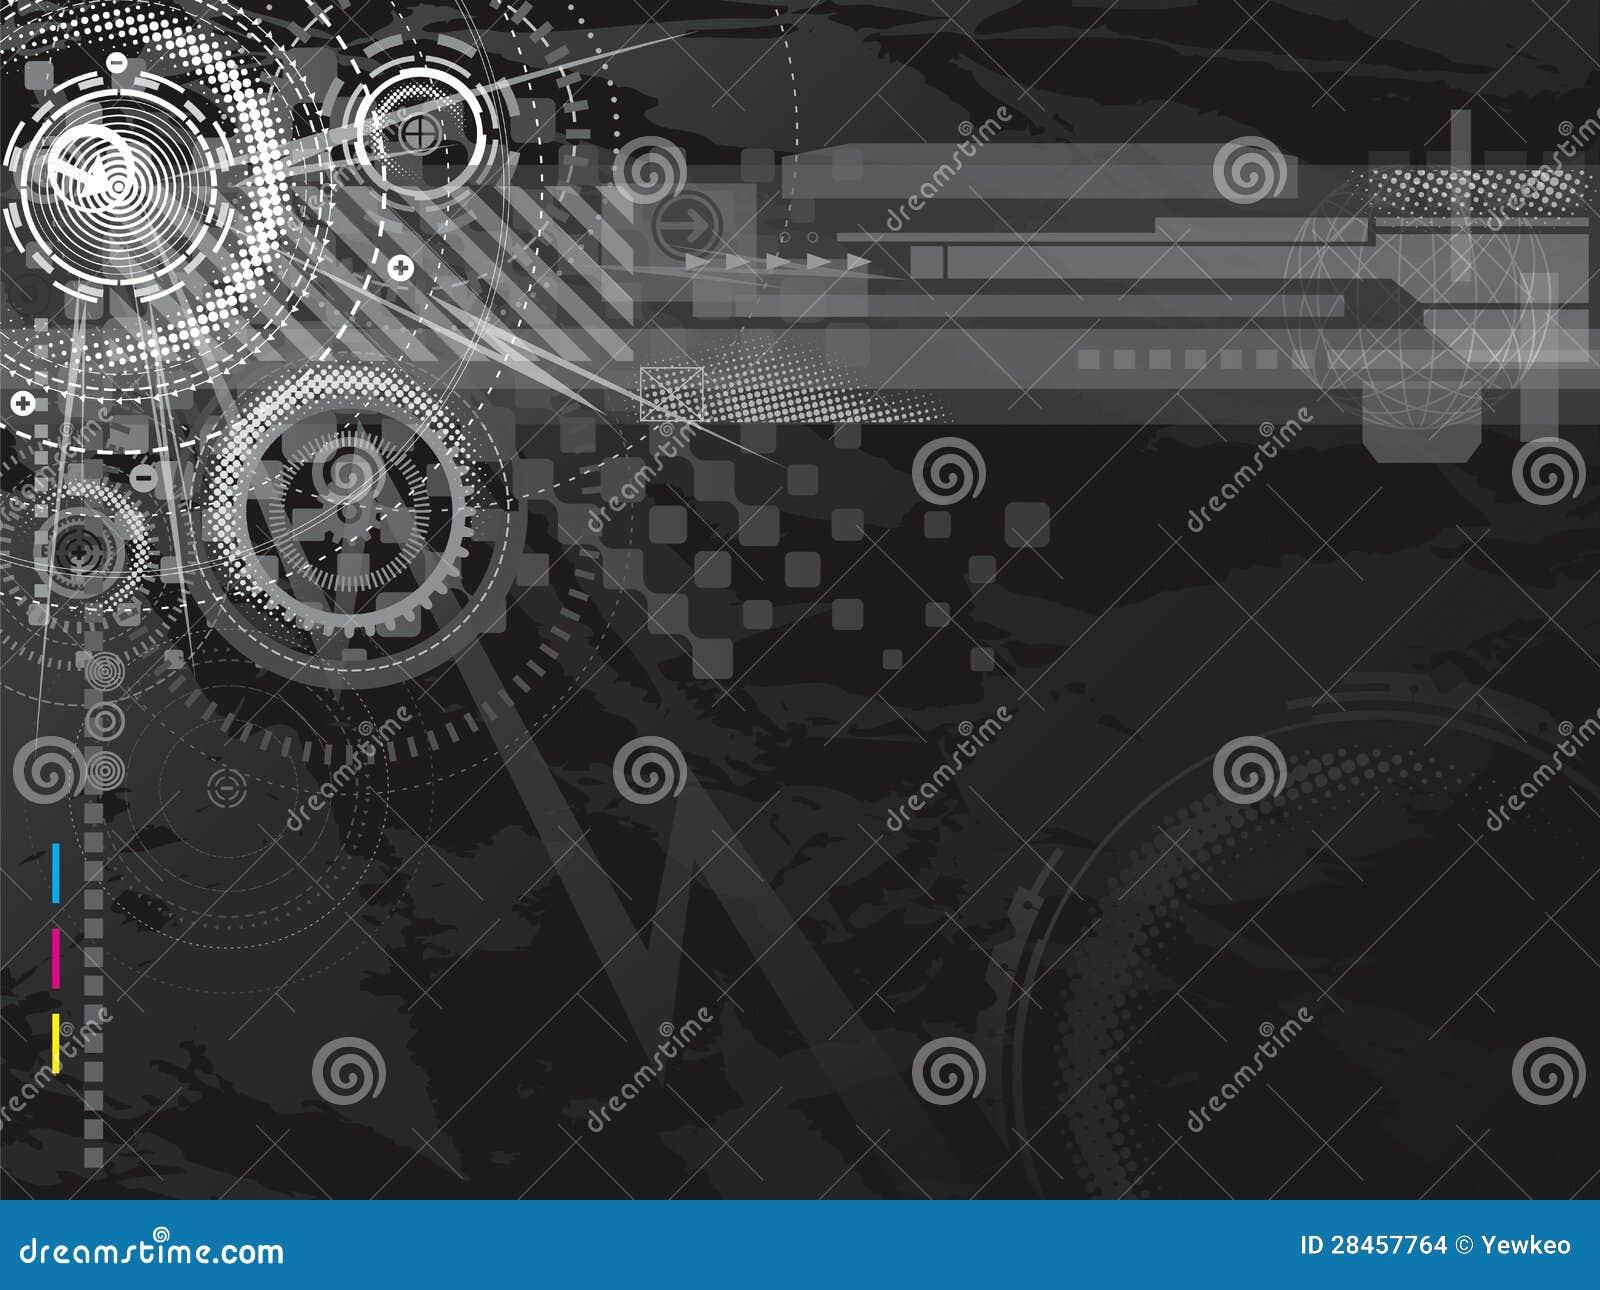 technology background black - photo #36